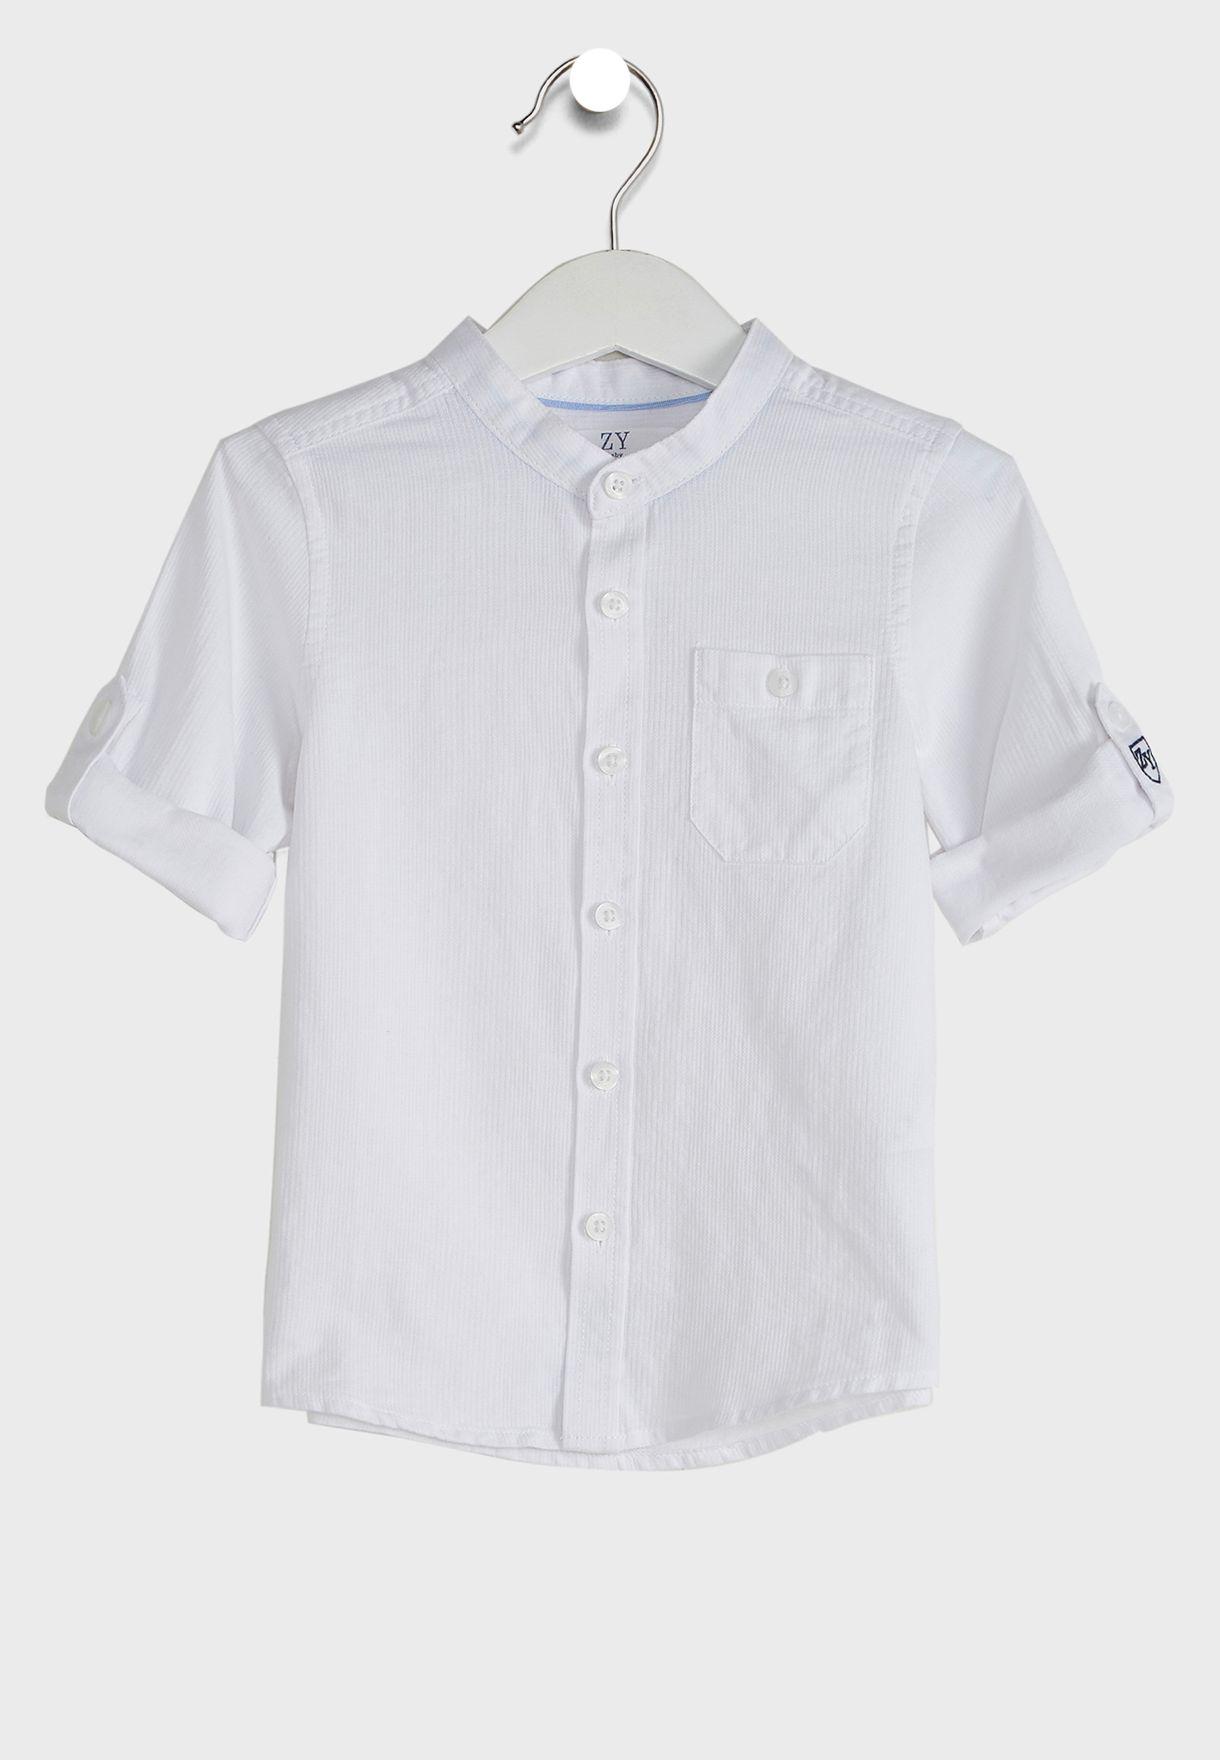 Infant Essential Shirt